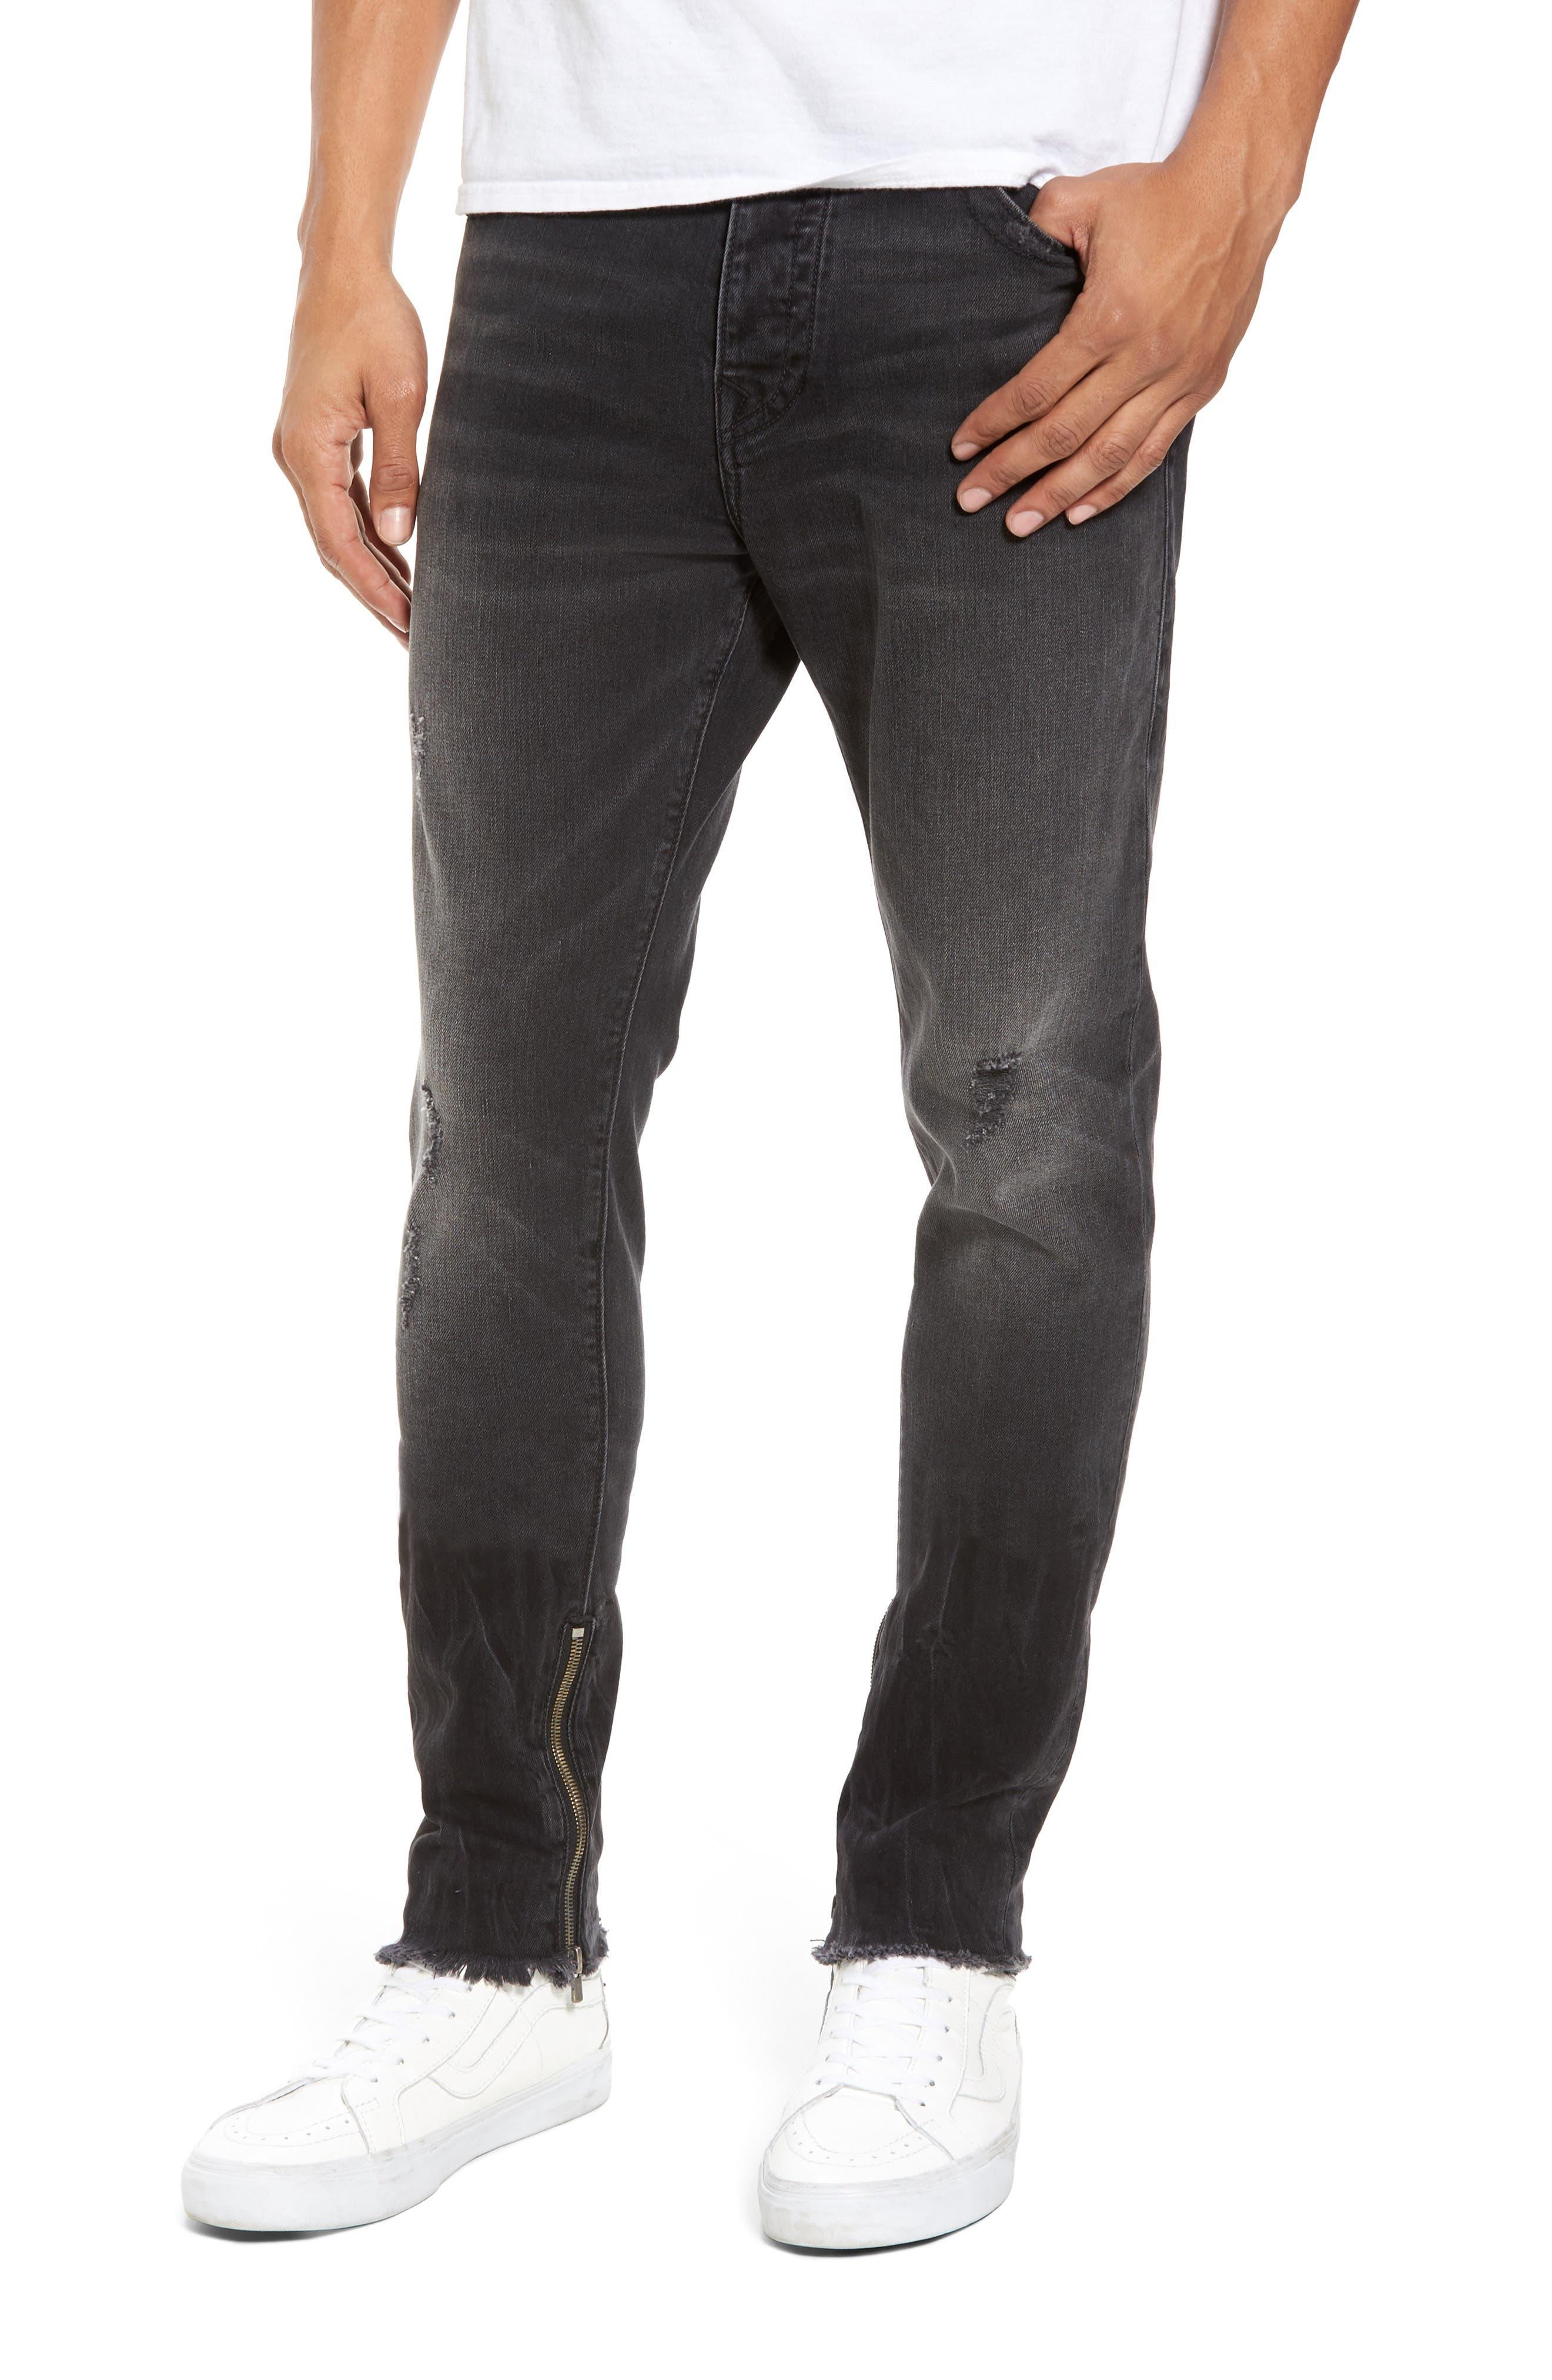 Main Image - True Religion Brand Jeans Finn Frayed Skinny Fit Jeans (Dark Envy)